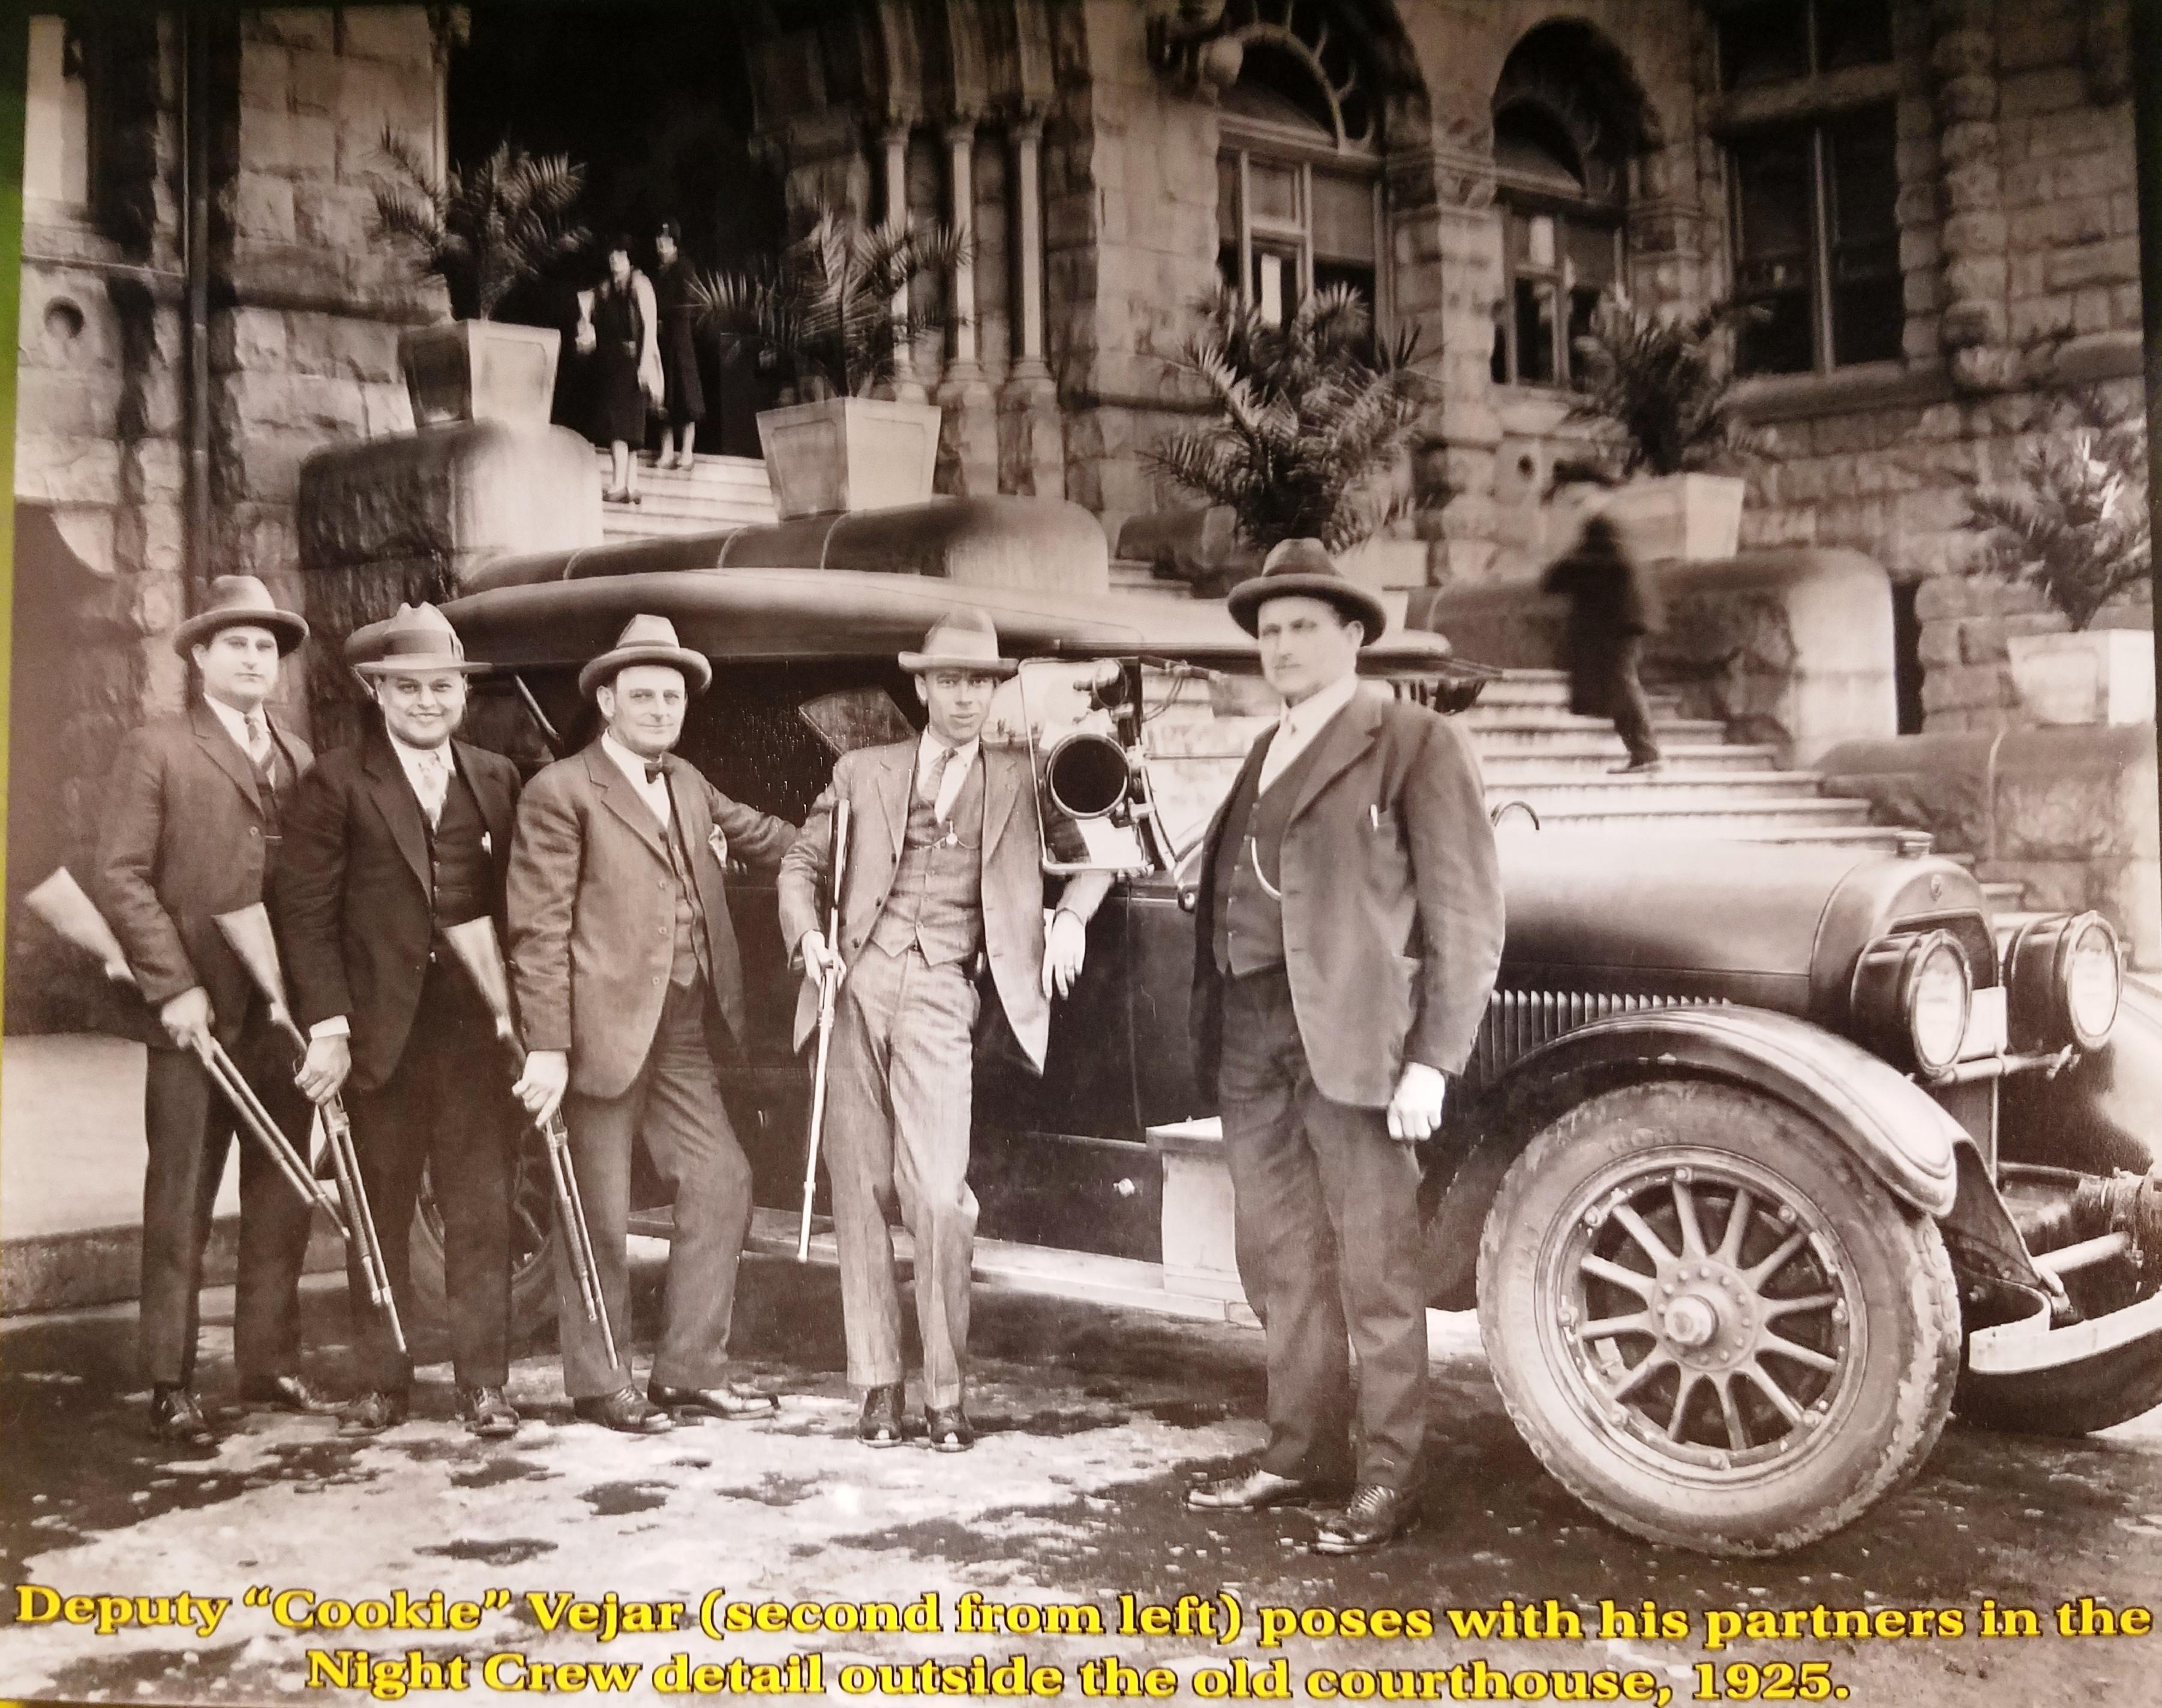 LASD Night Crew Detail 1925